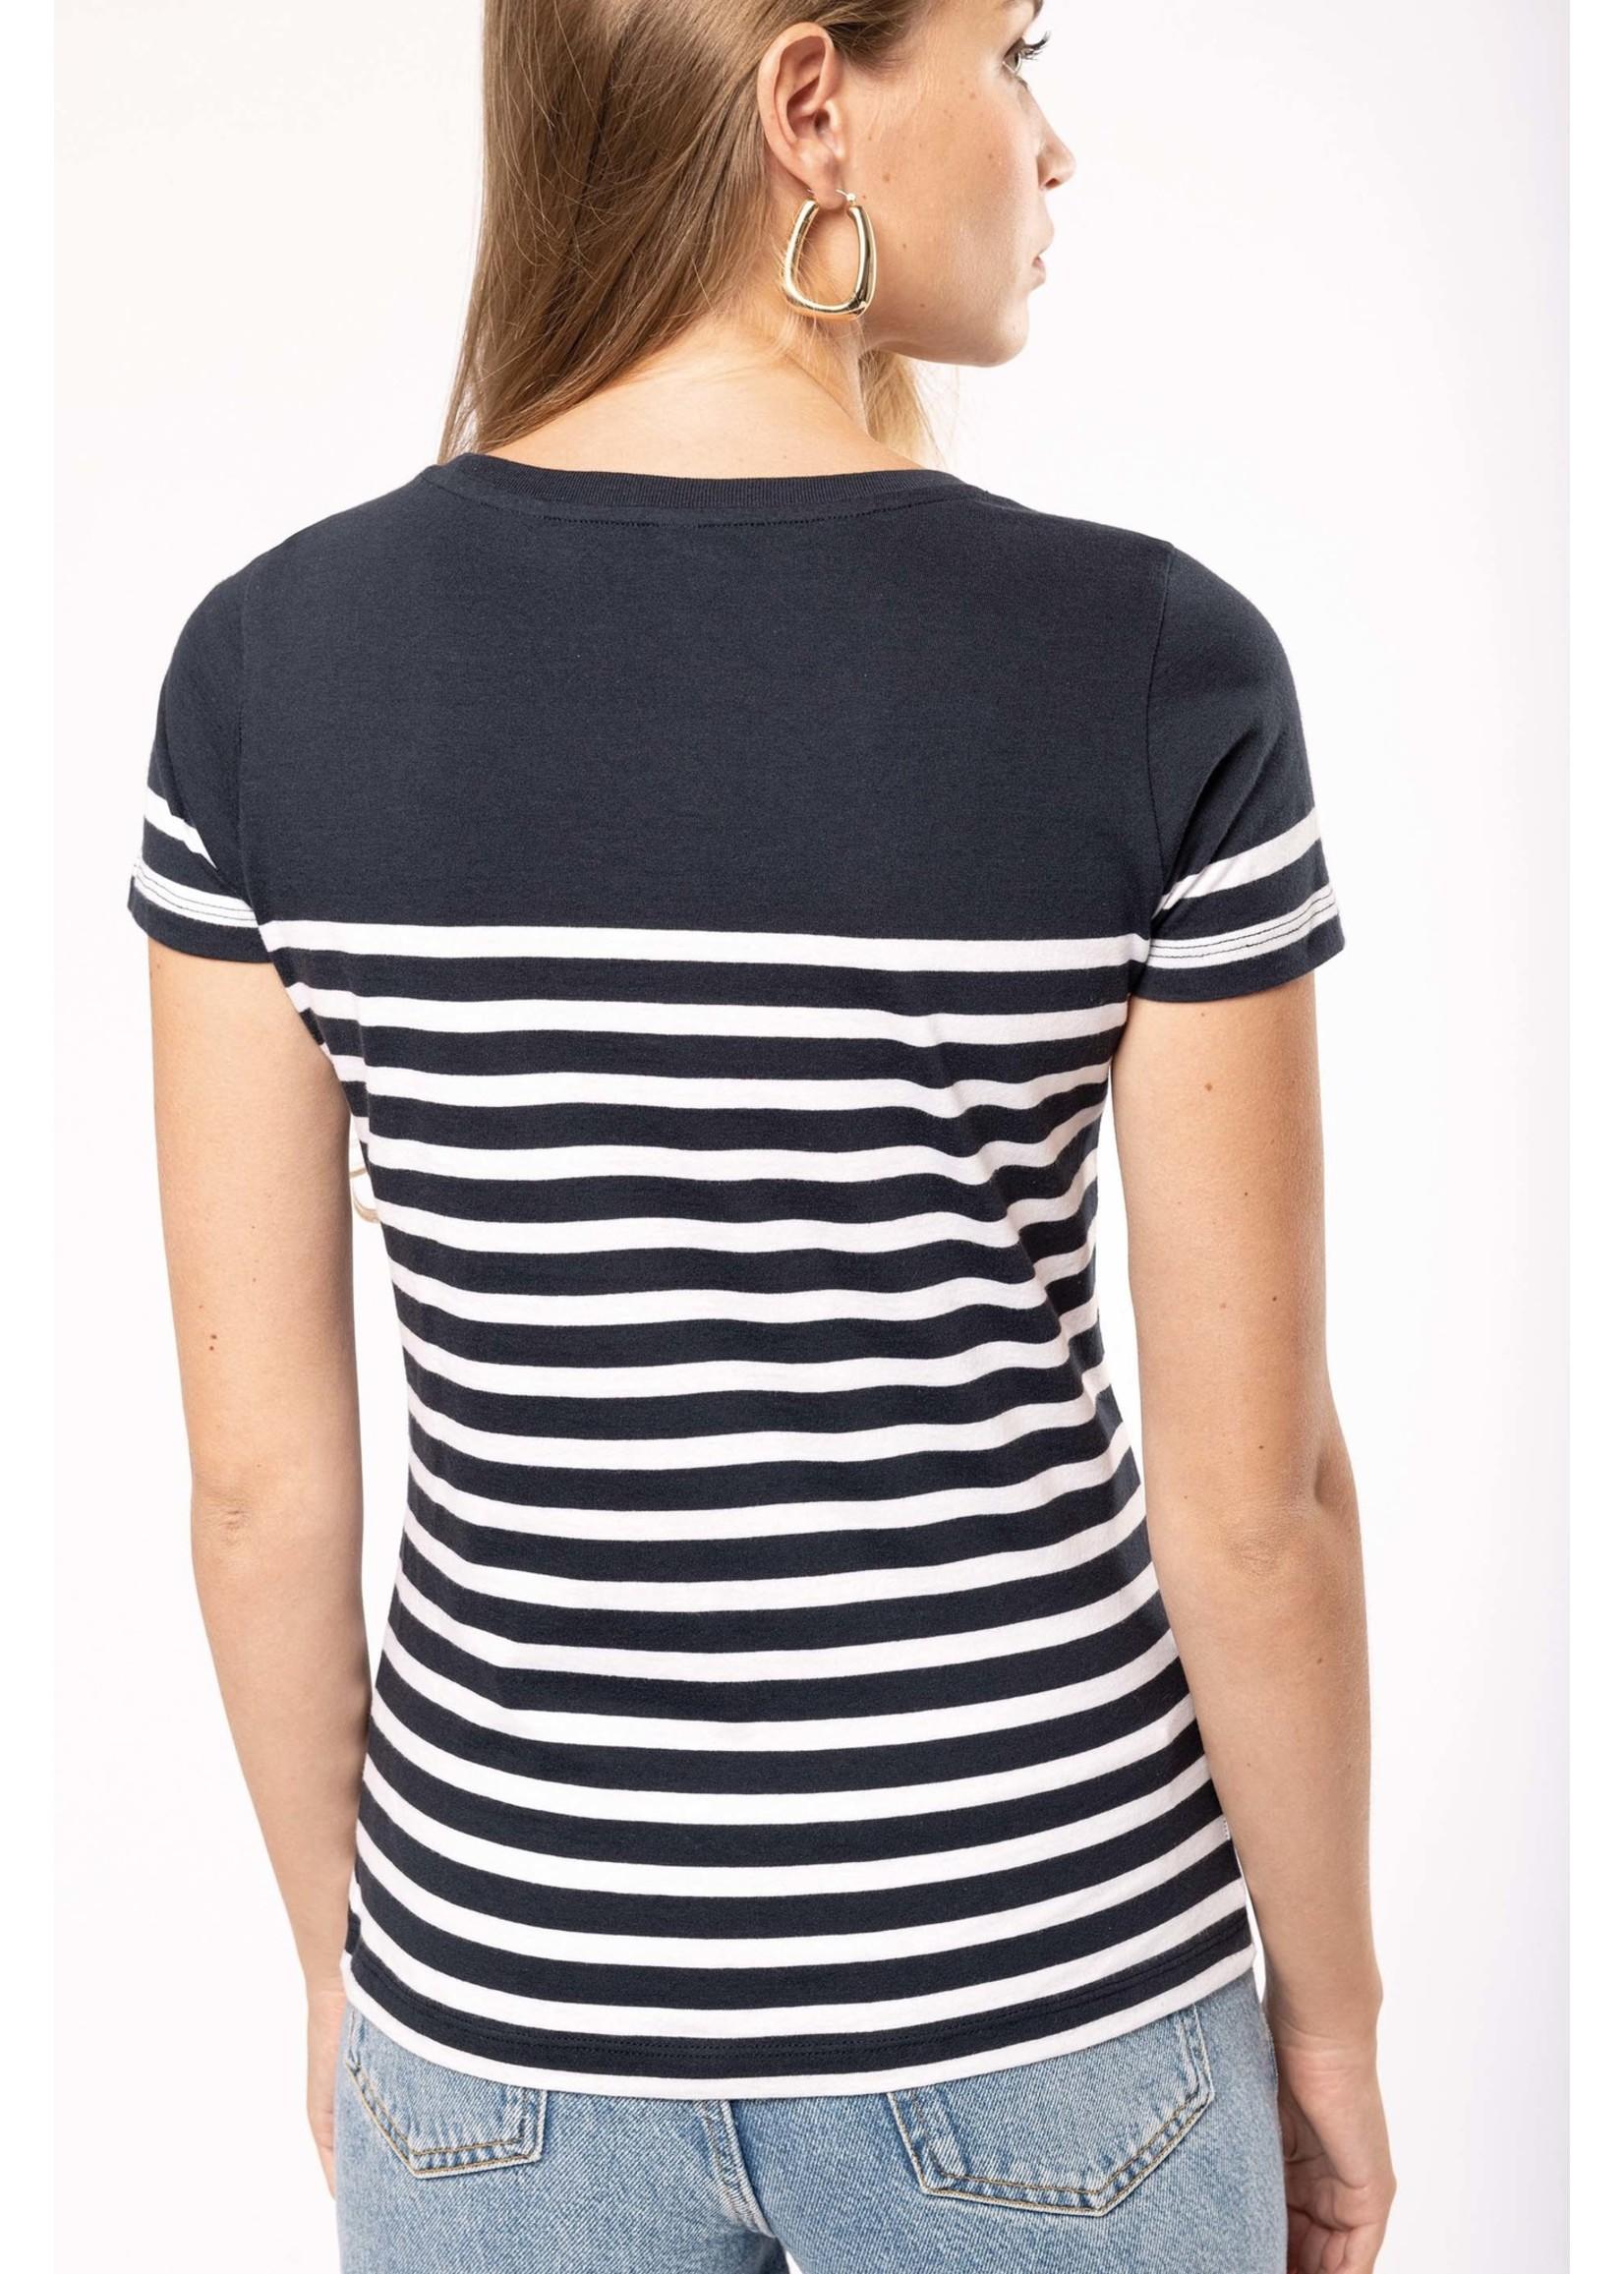 Eco-Friendly  Marine-t-shirt DAMES  Wit-Navy